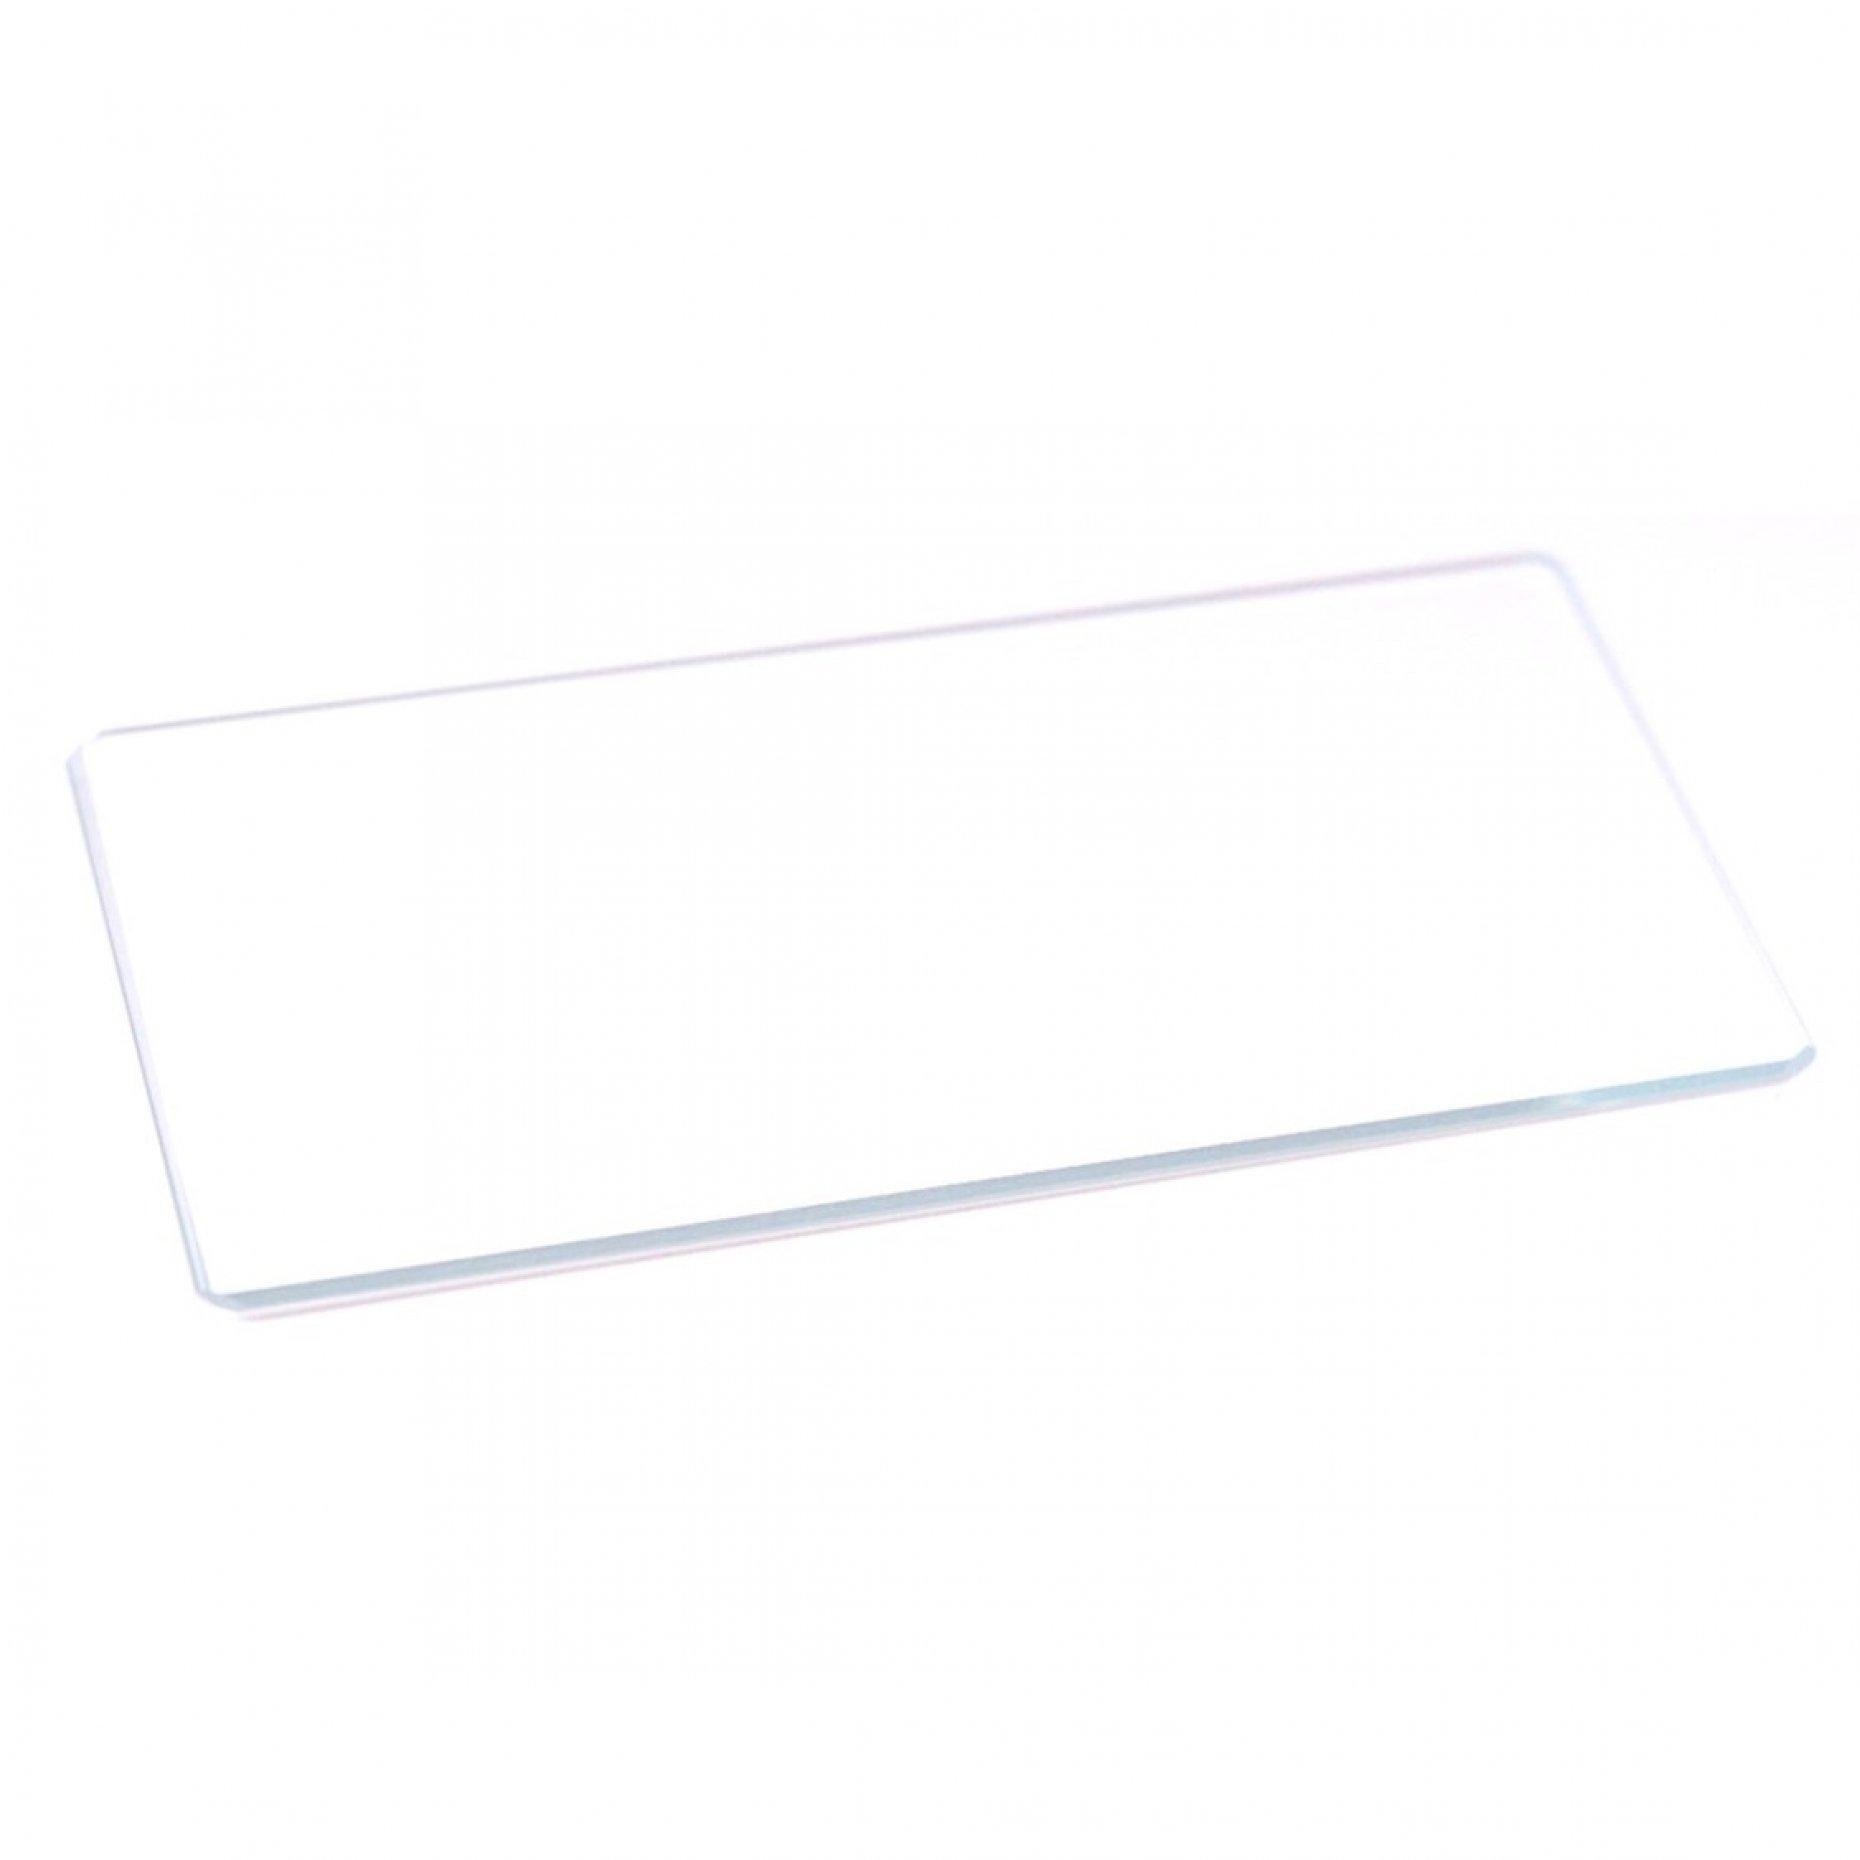 S51 Spare Coverglass